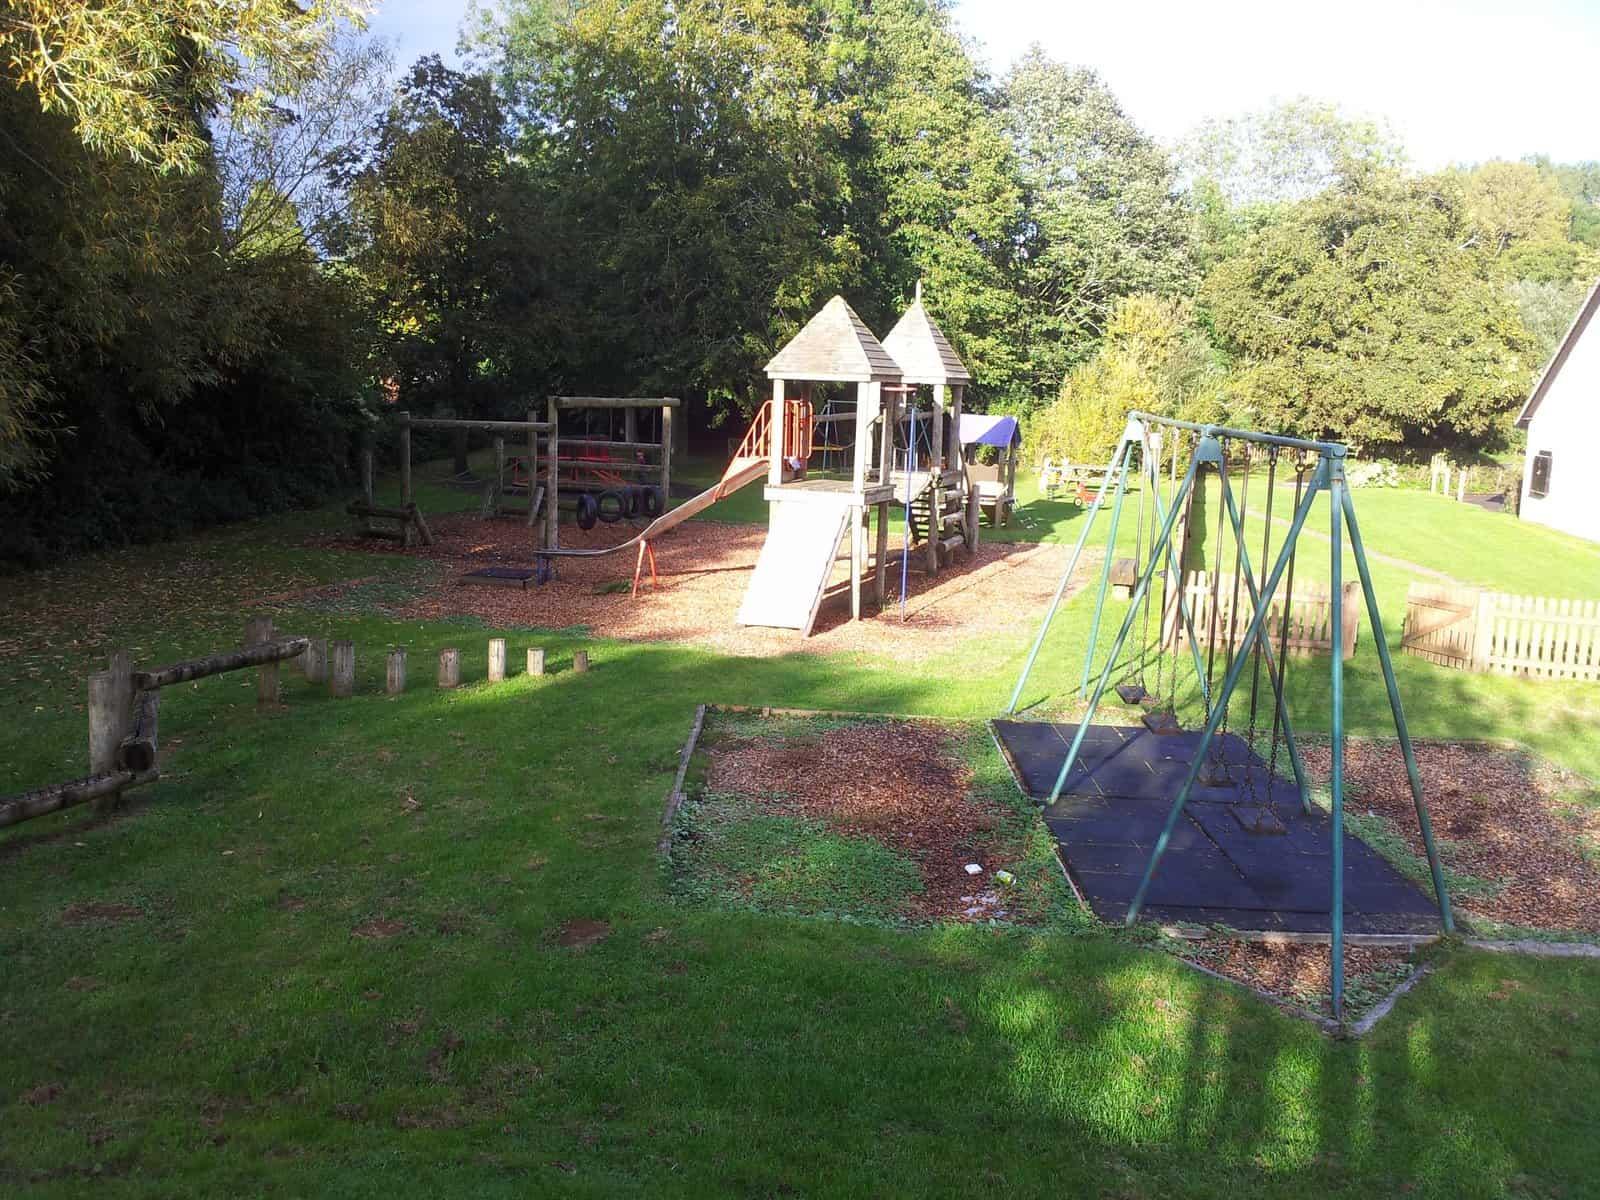 Standlake Recreation Ground